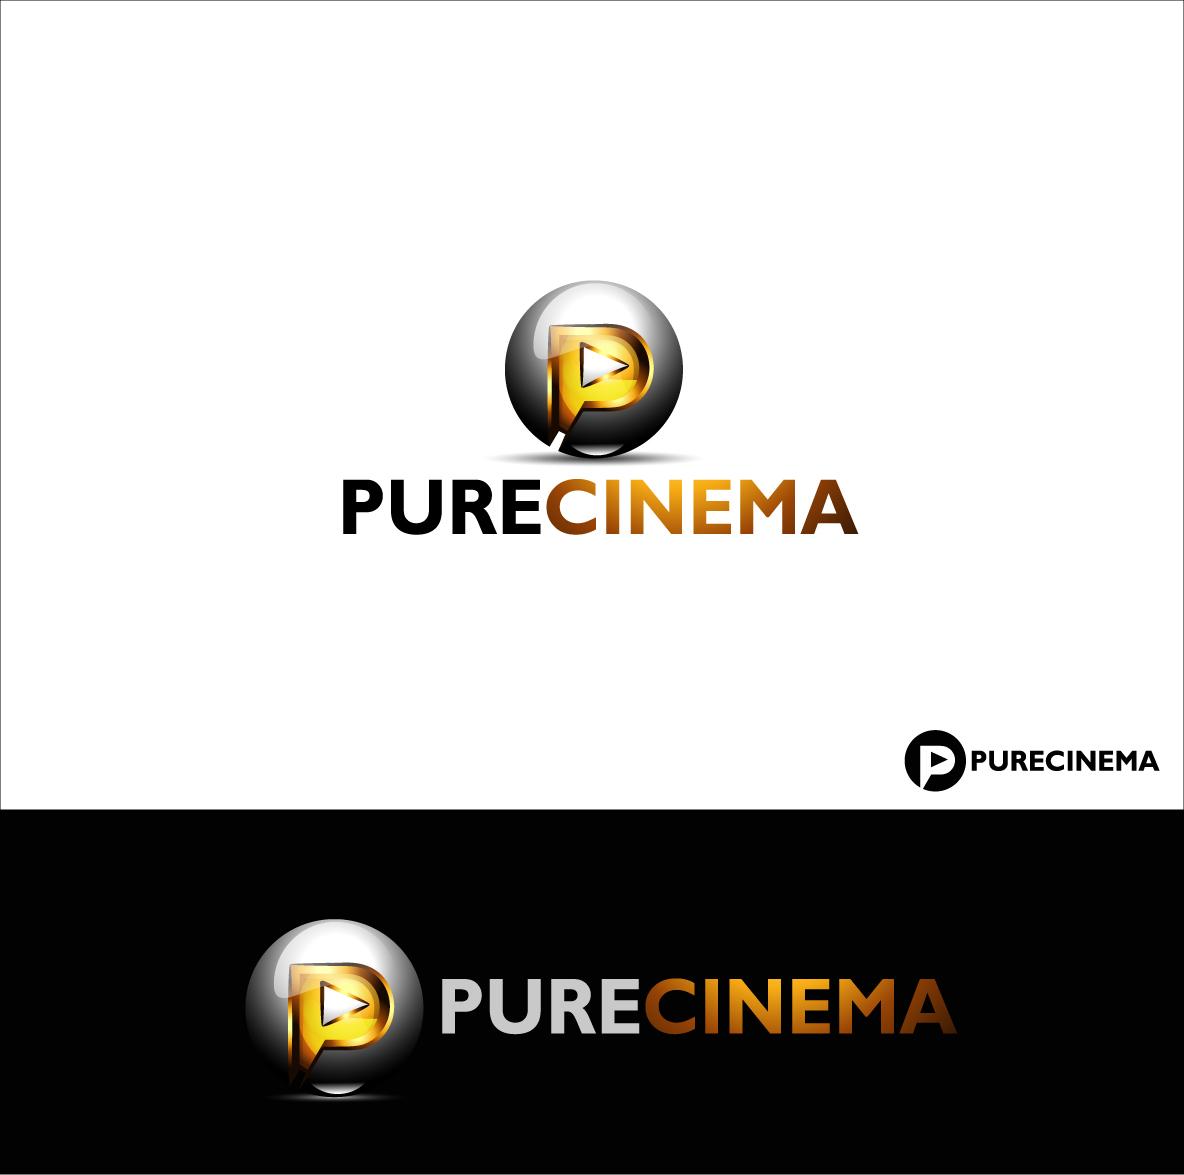 Logo Design by zoiDesign - Entry No. 109 in the Logo Design Contest Imaginative Logo Design for Pure Cinema.